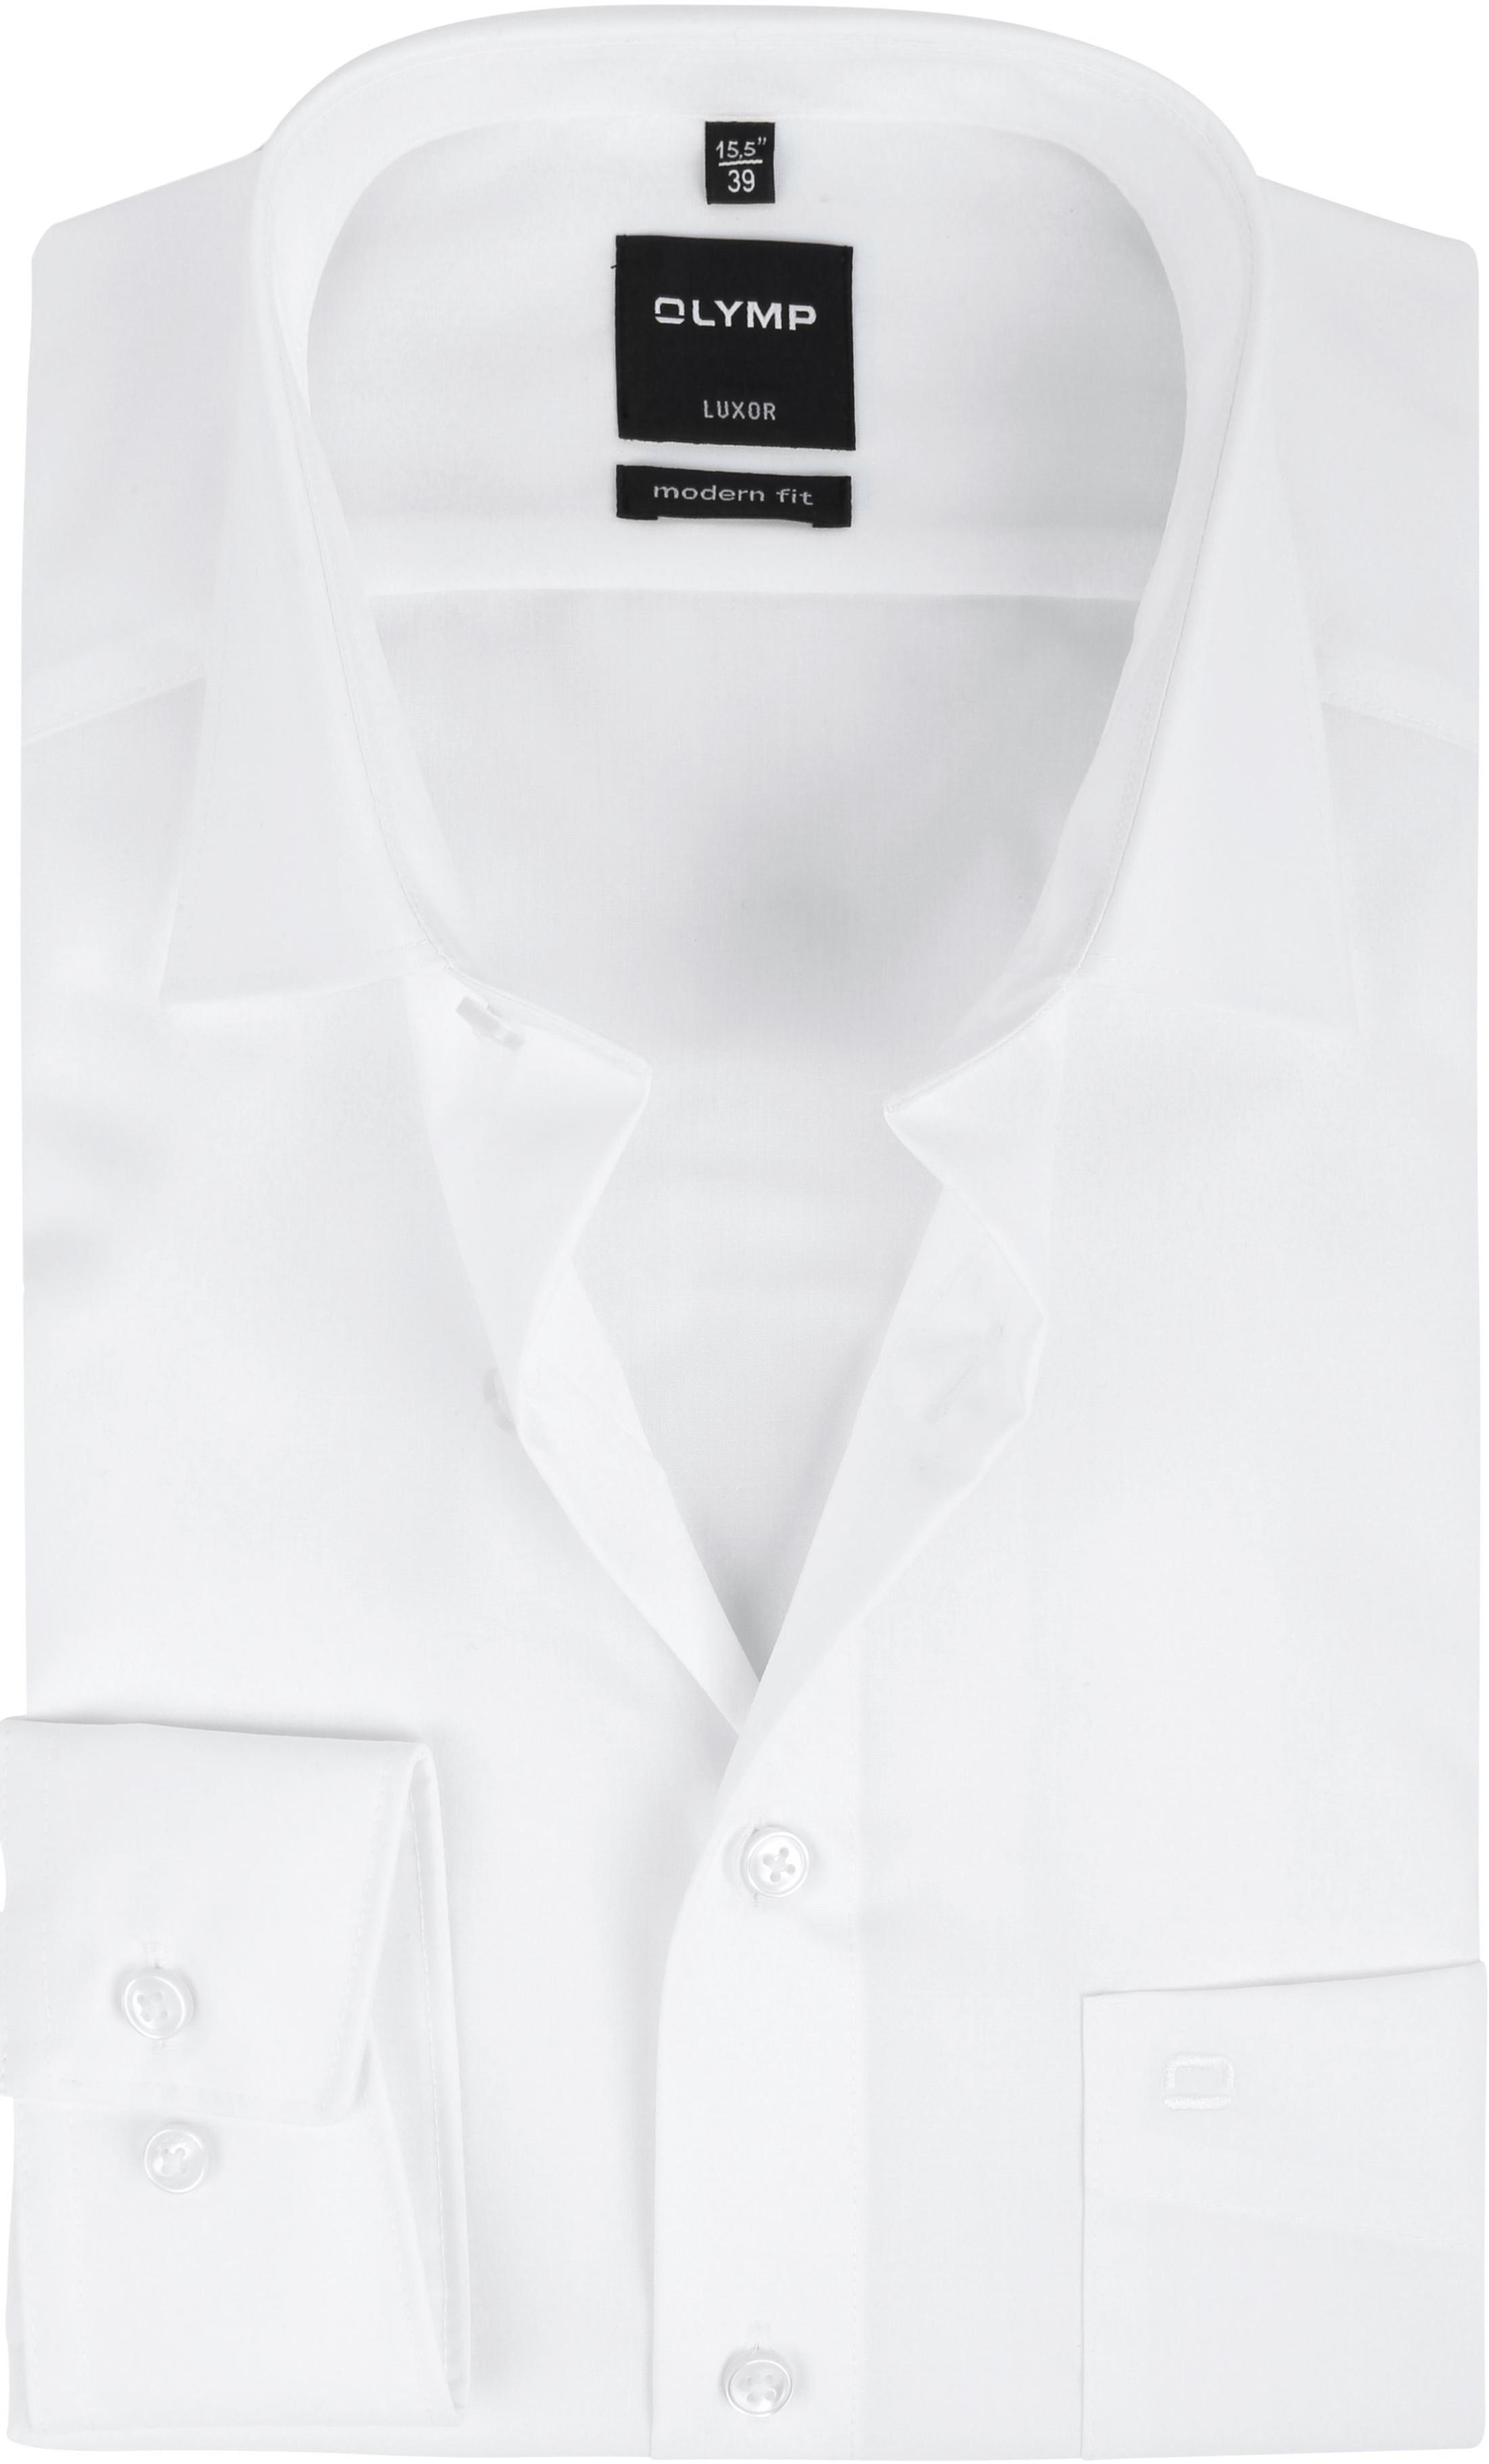 Olymp Overhemd Wit foto 0